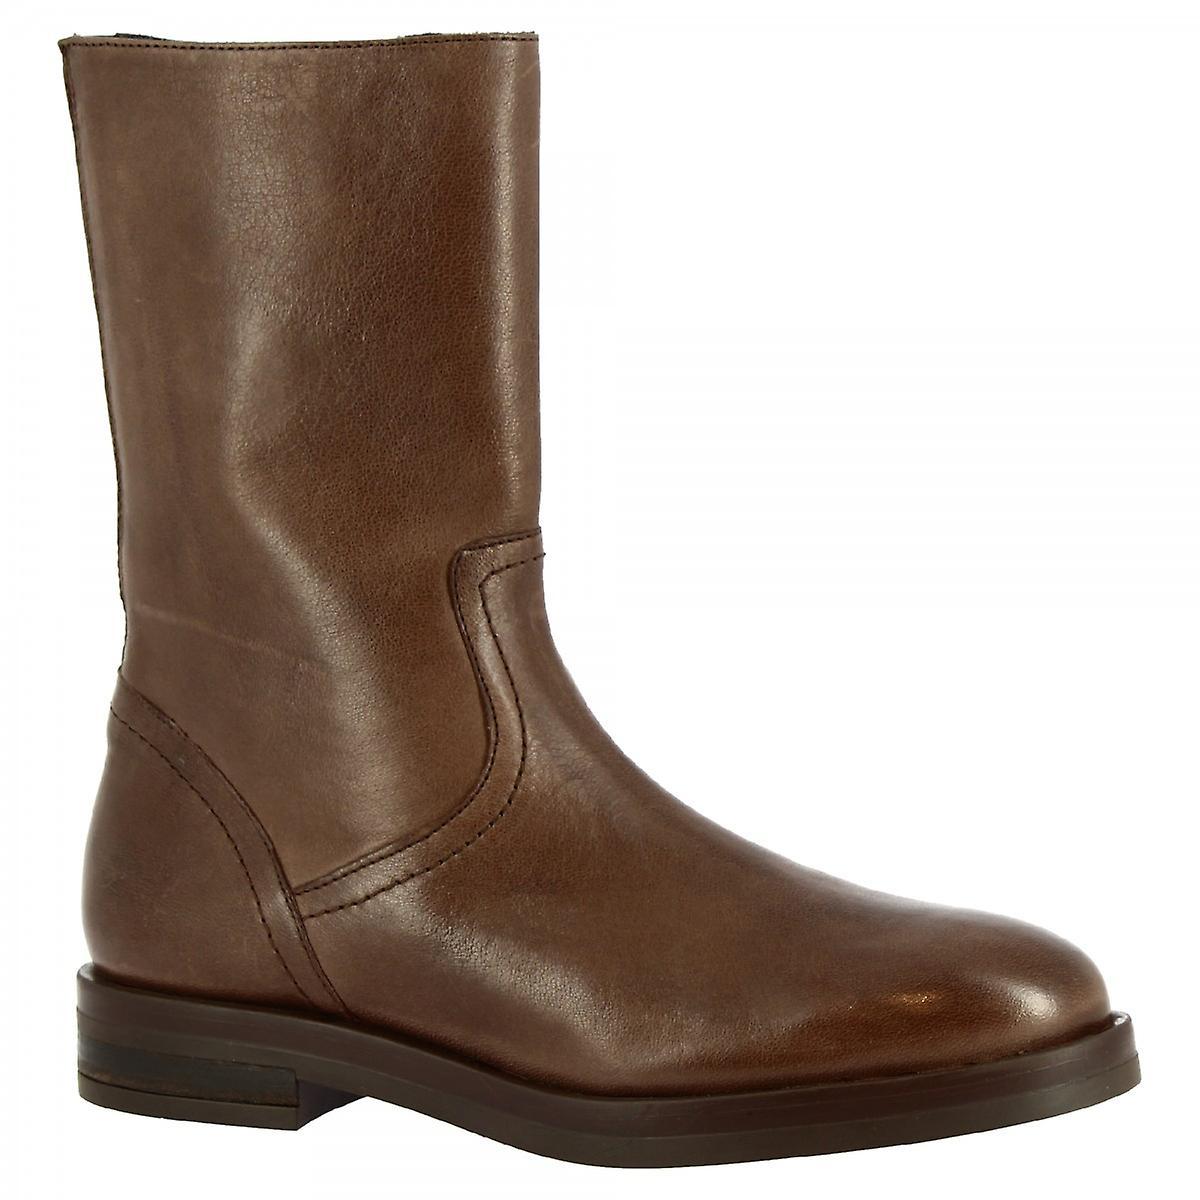 Leonardo Shoes Women's handmade mid calf boots in dark brown leather side zip xsvjF